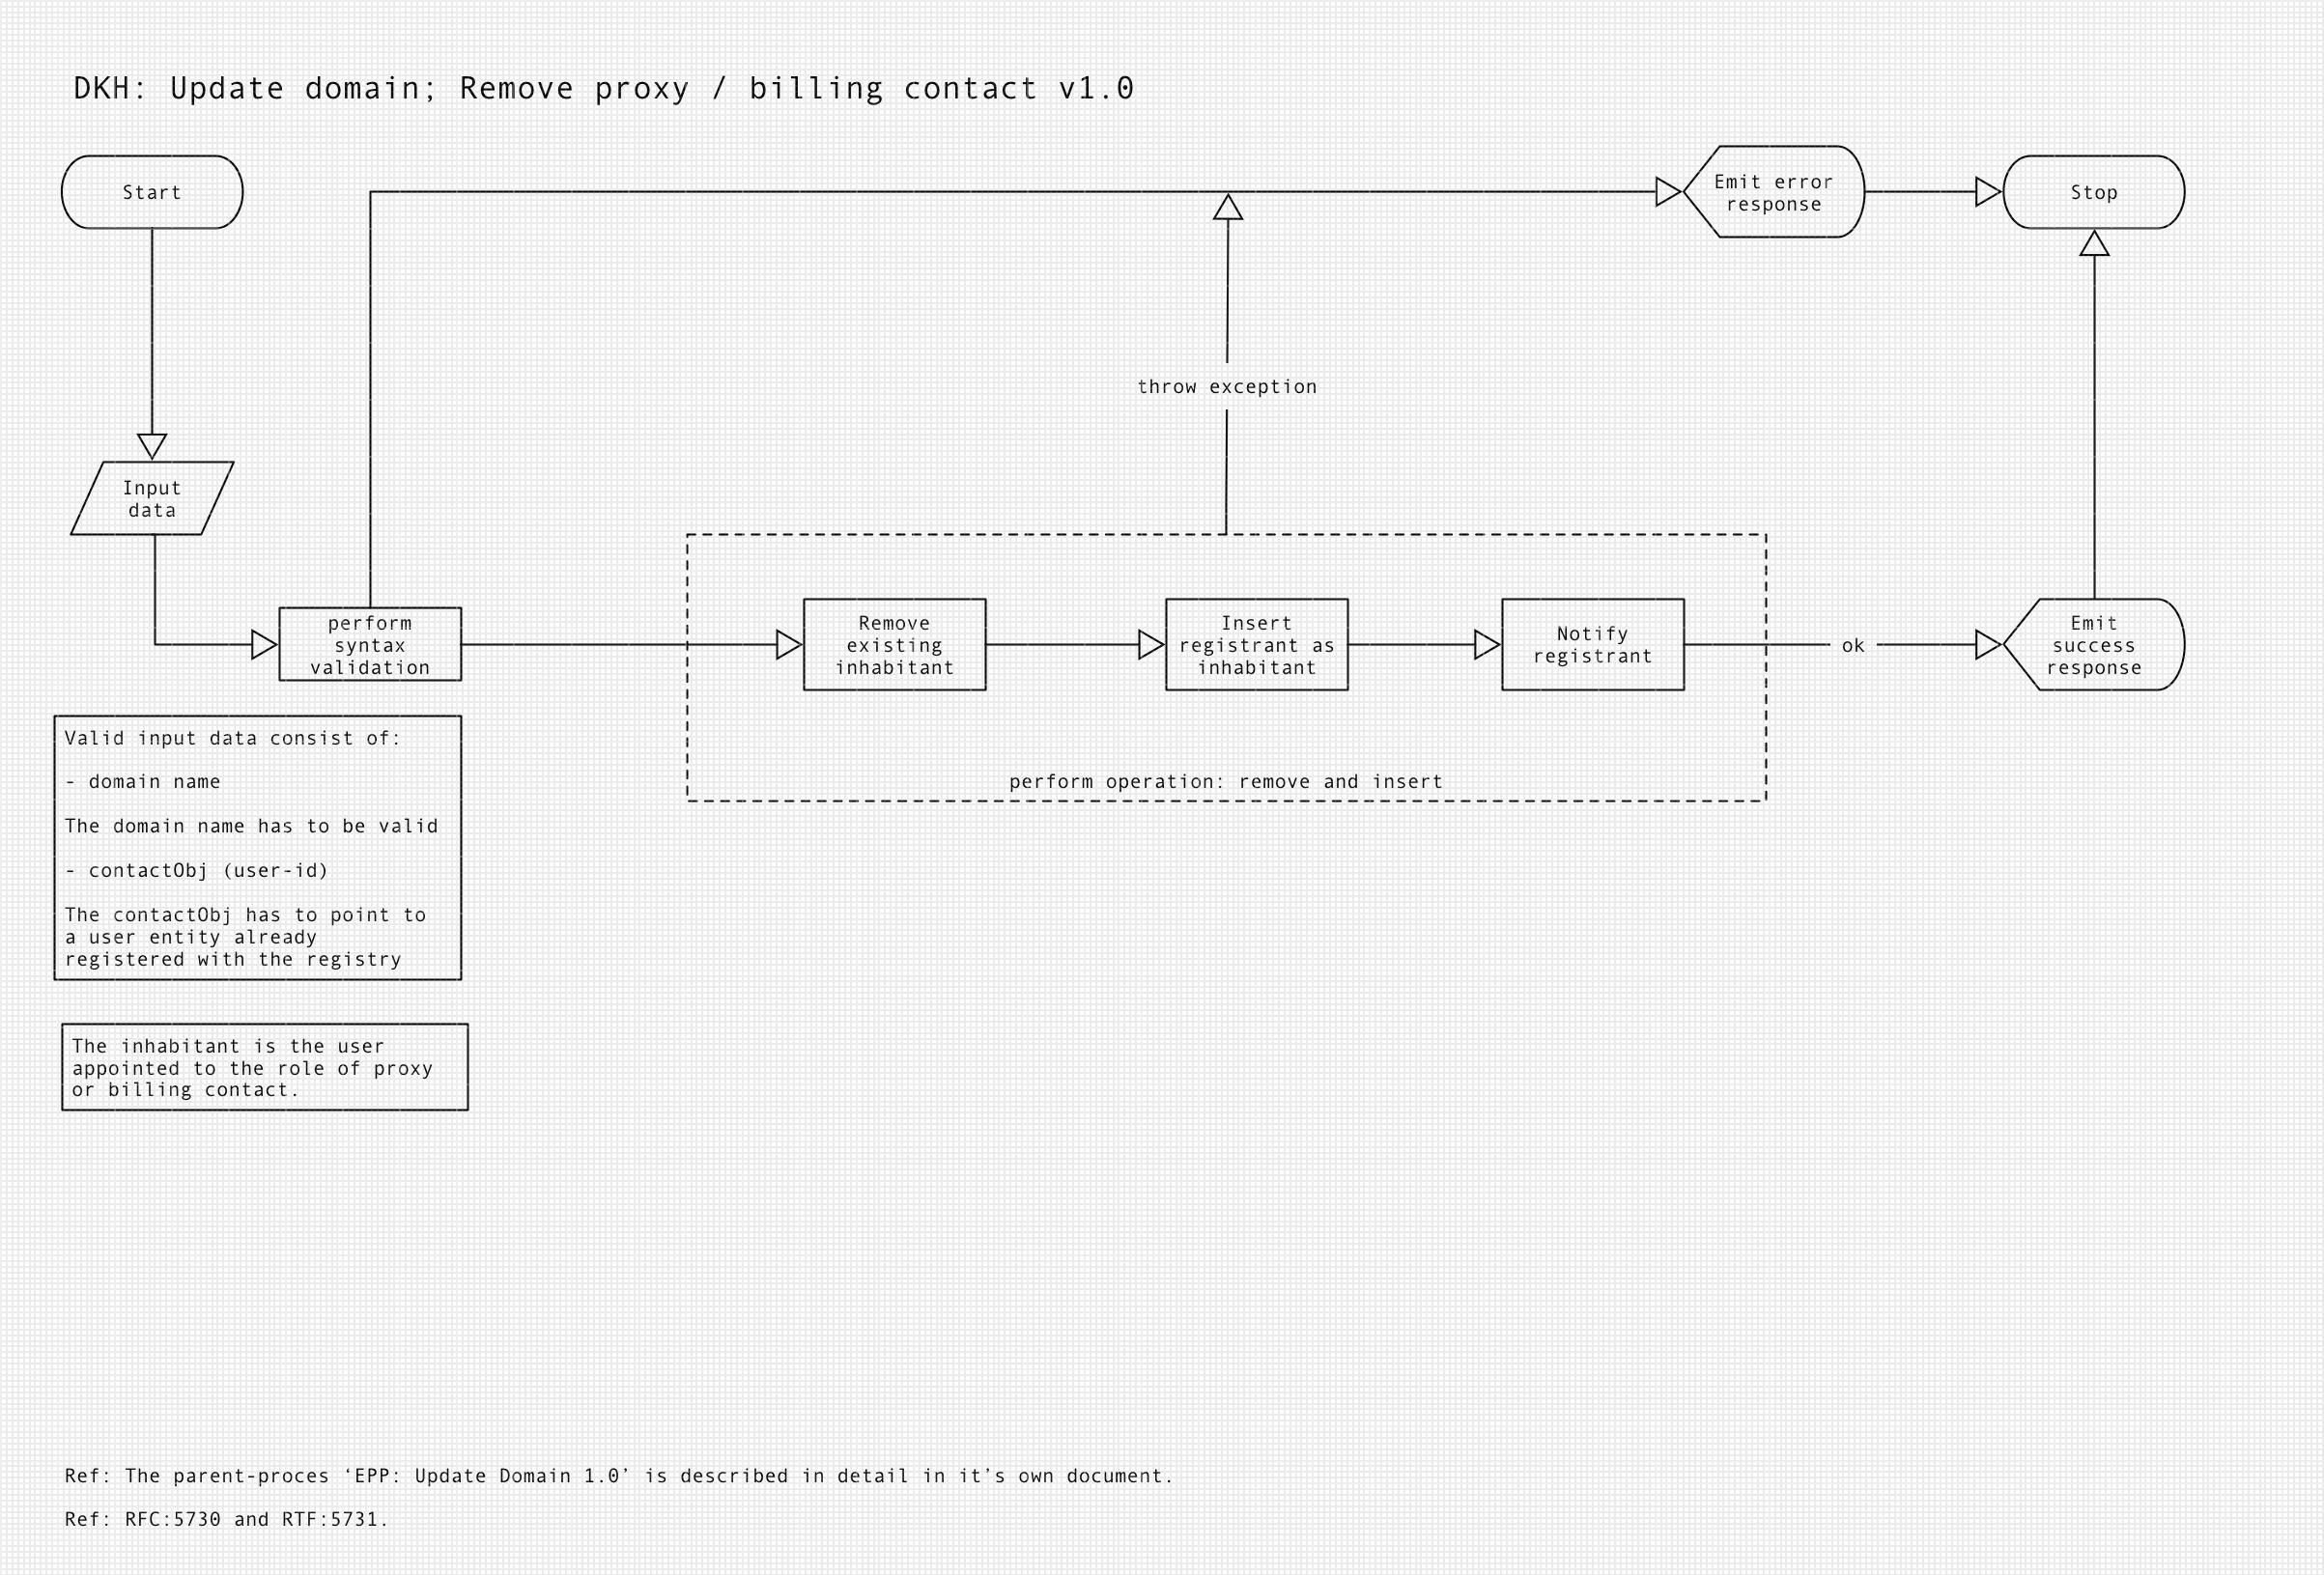 Update domain - Remove billing/admin contact sub-process